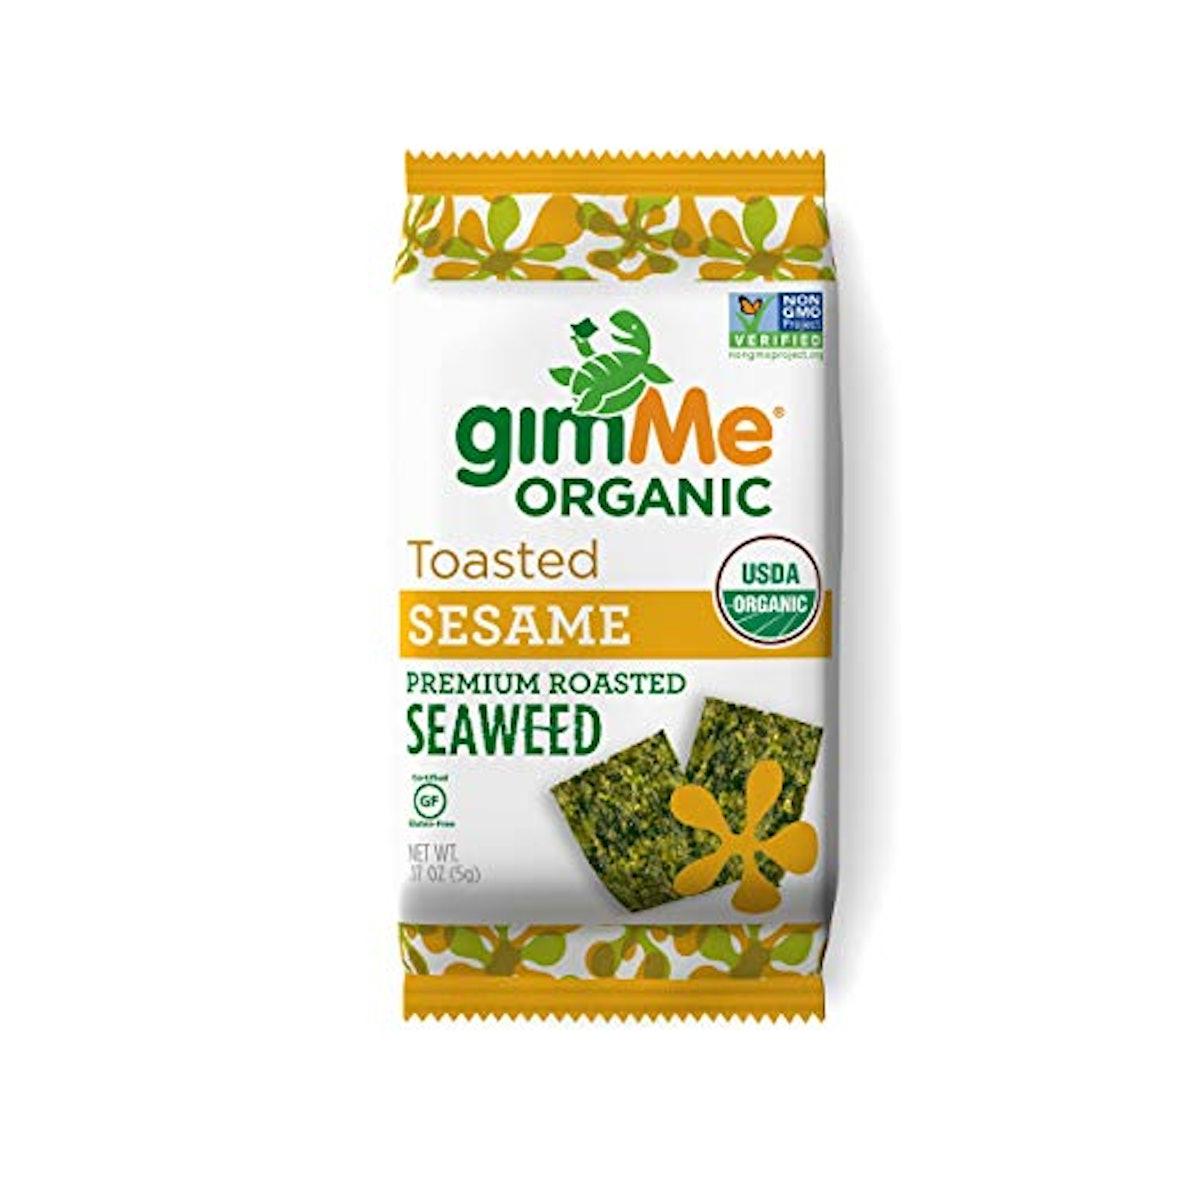 gimMe Snacks Organic Roasted Seaweed (Pack of 12)